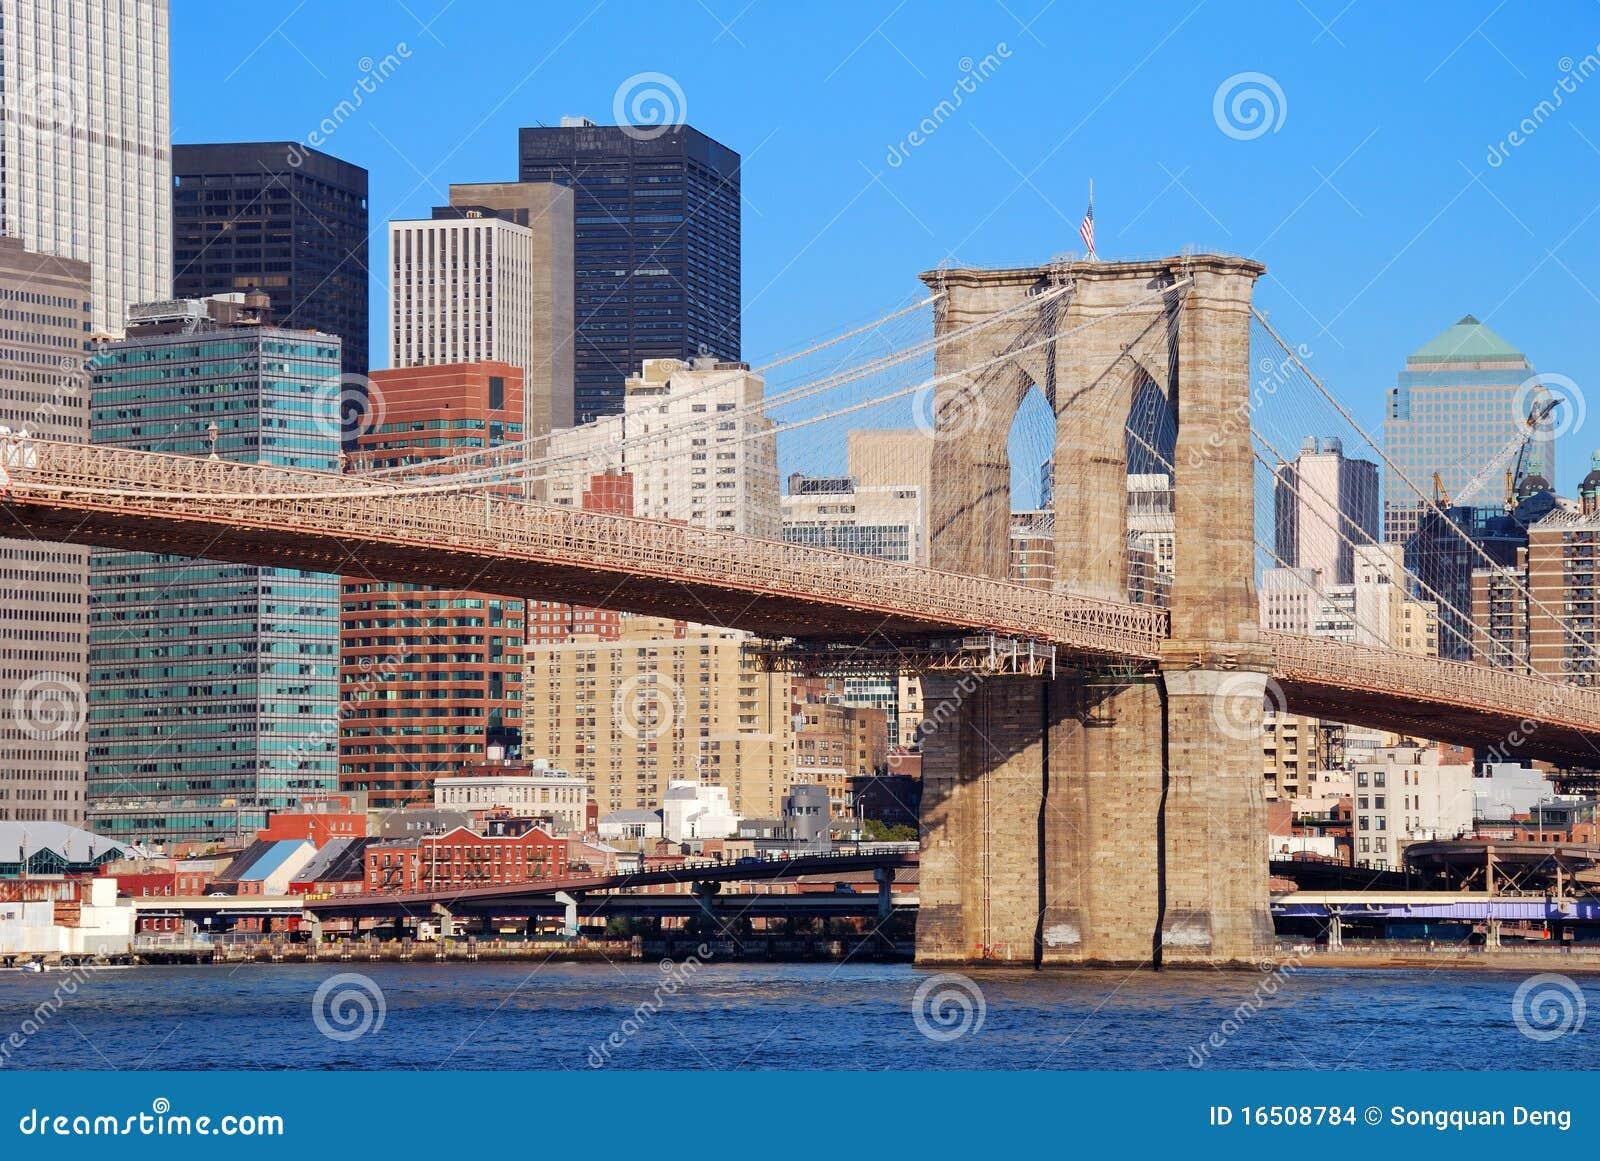 New york city manhattan skyline with brooklyn bridge and skyscrapers